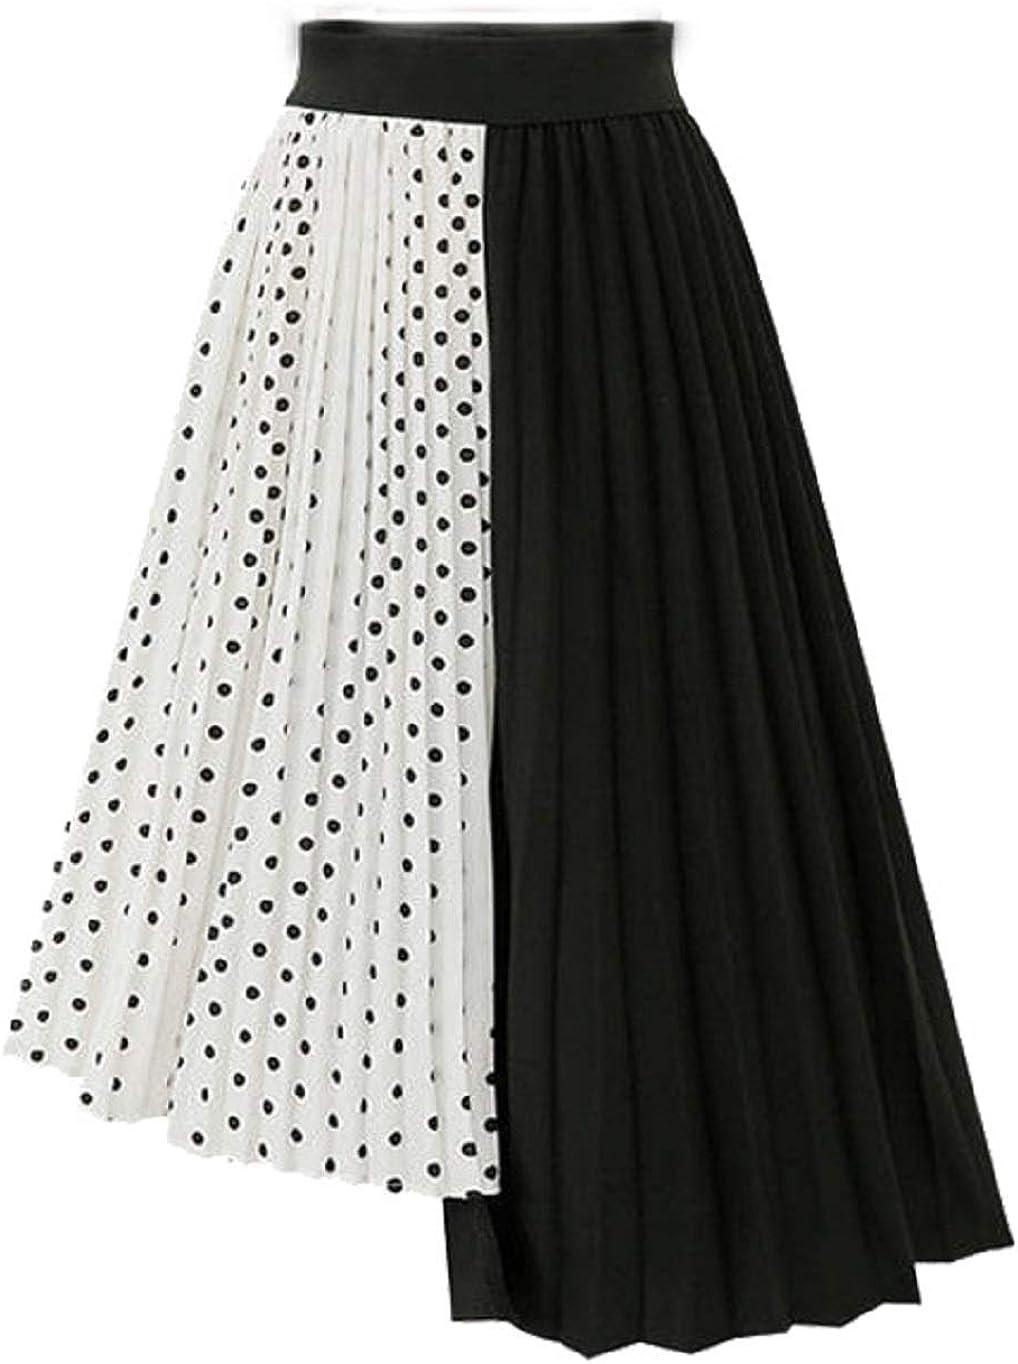 CHARTOU Women's Chiffon Polka Dot Pleated Ruffle Irregular Accordion A-Line Skirt